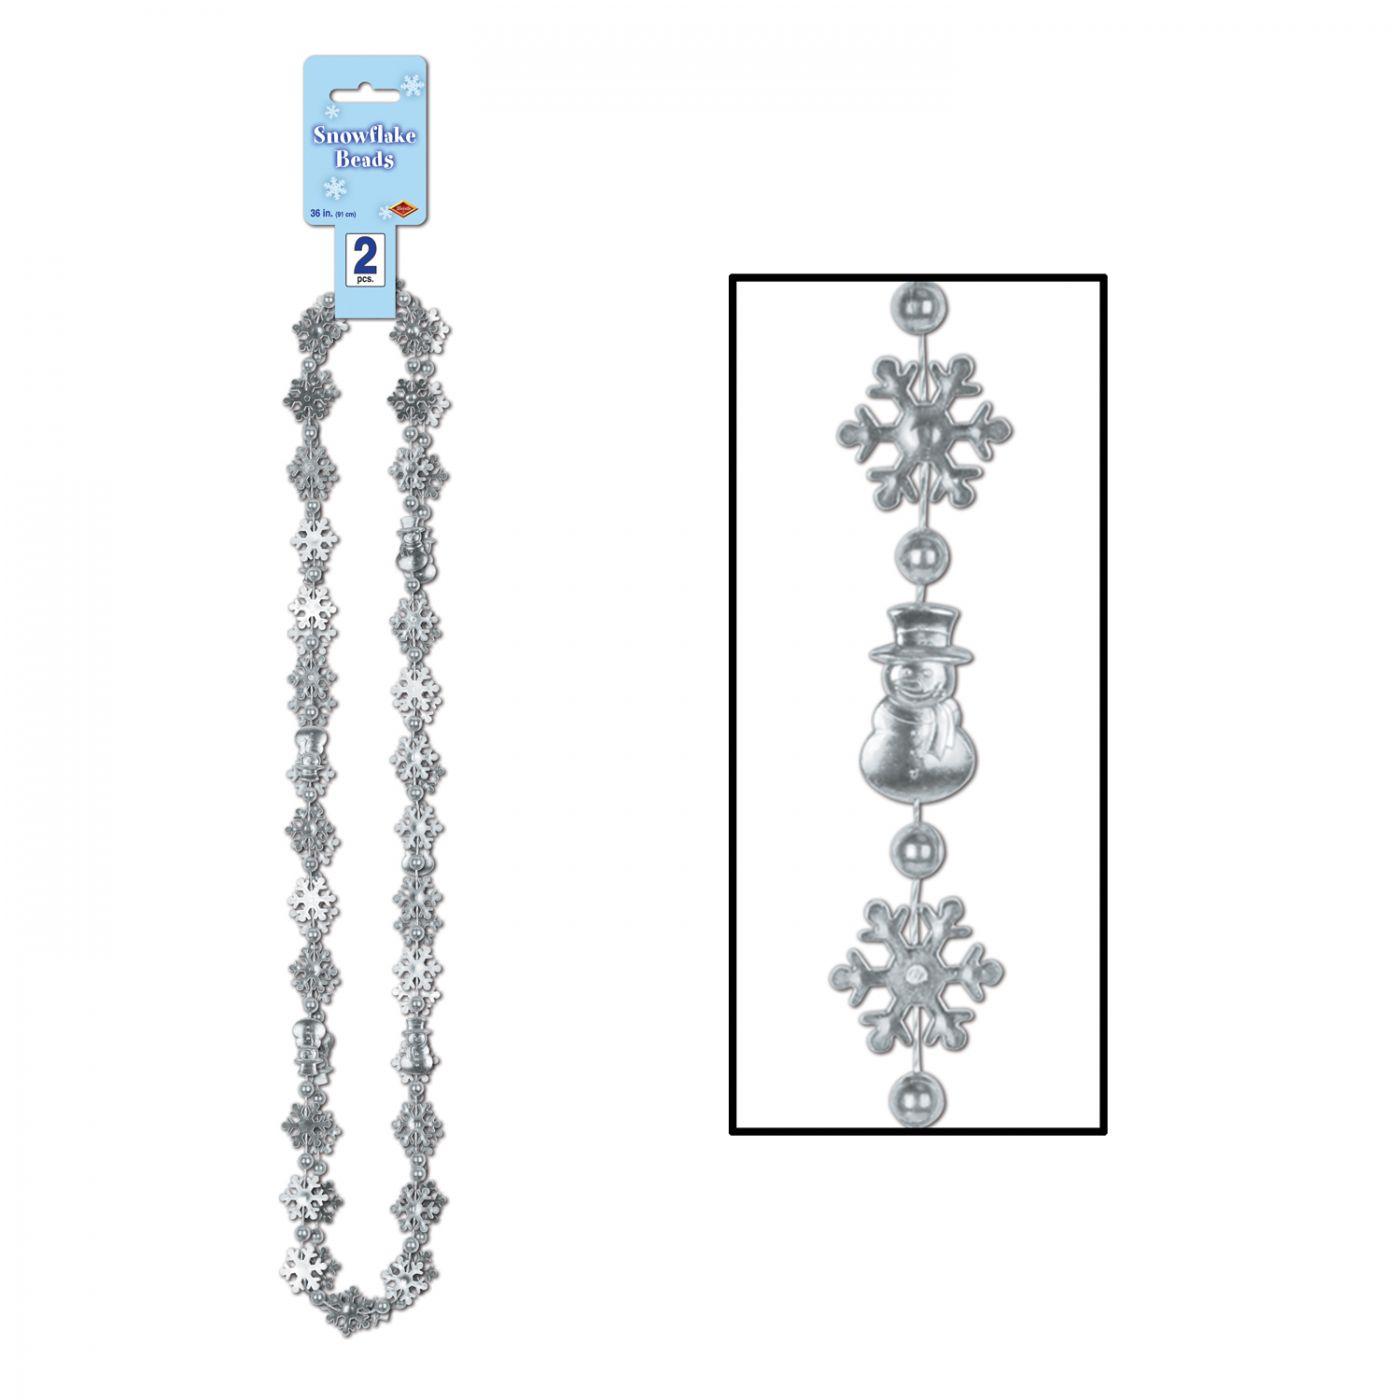 Snowflake Beads image